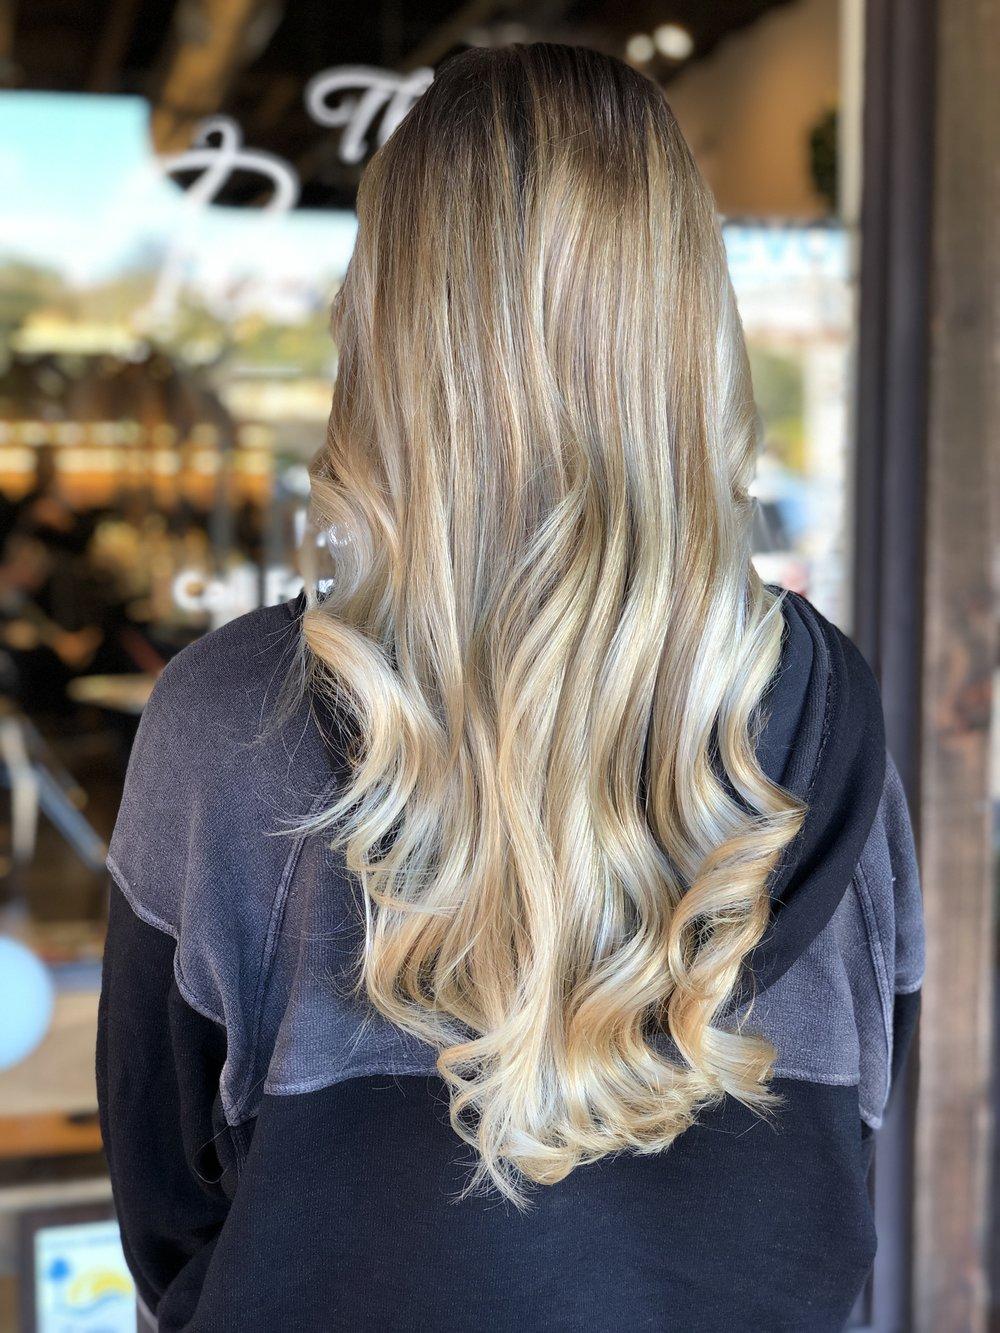 Gallery — The Parlour: Encinitas Hair Salon